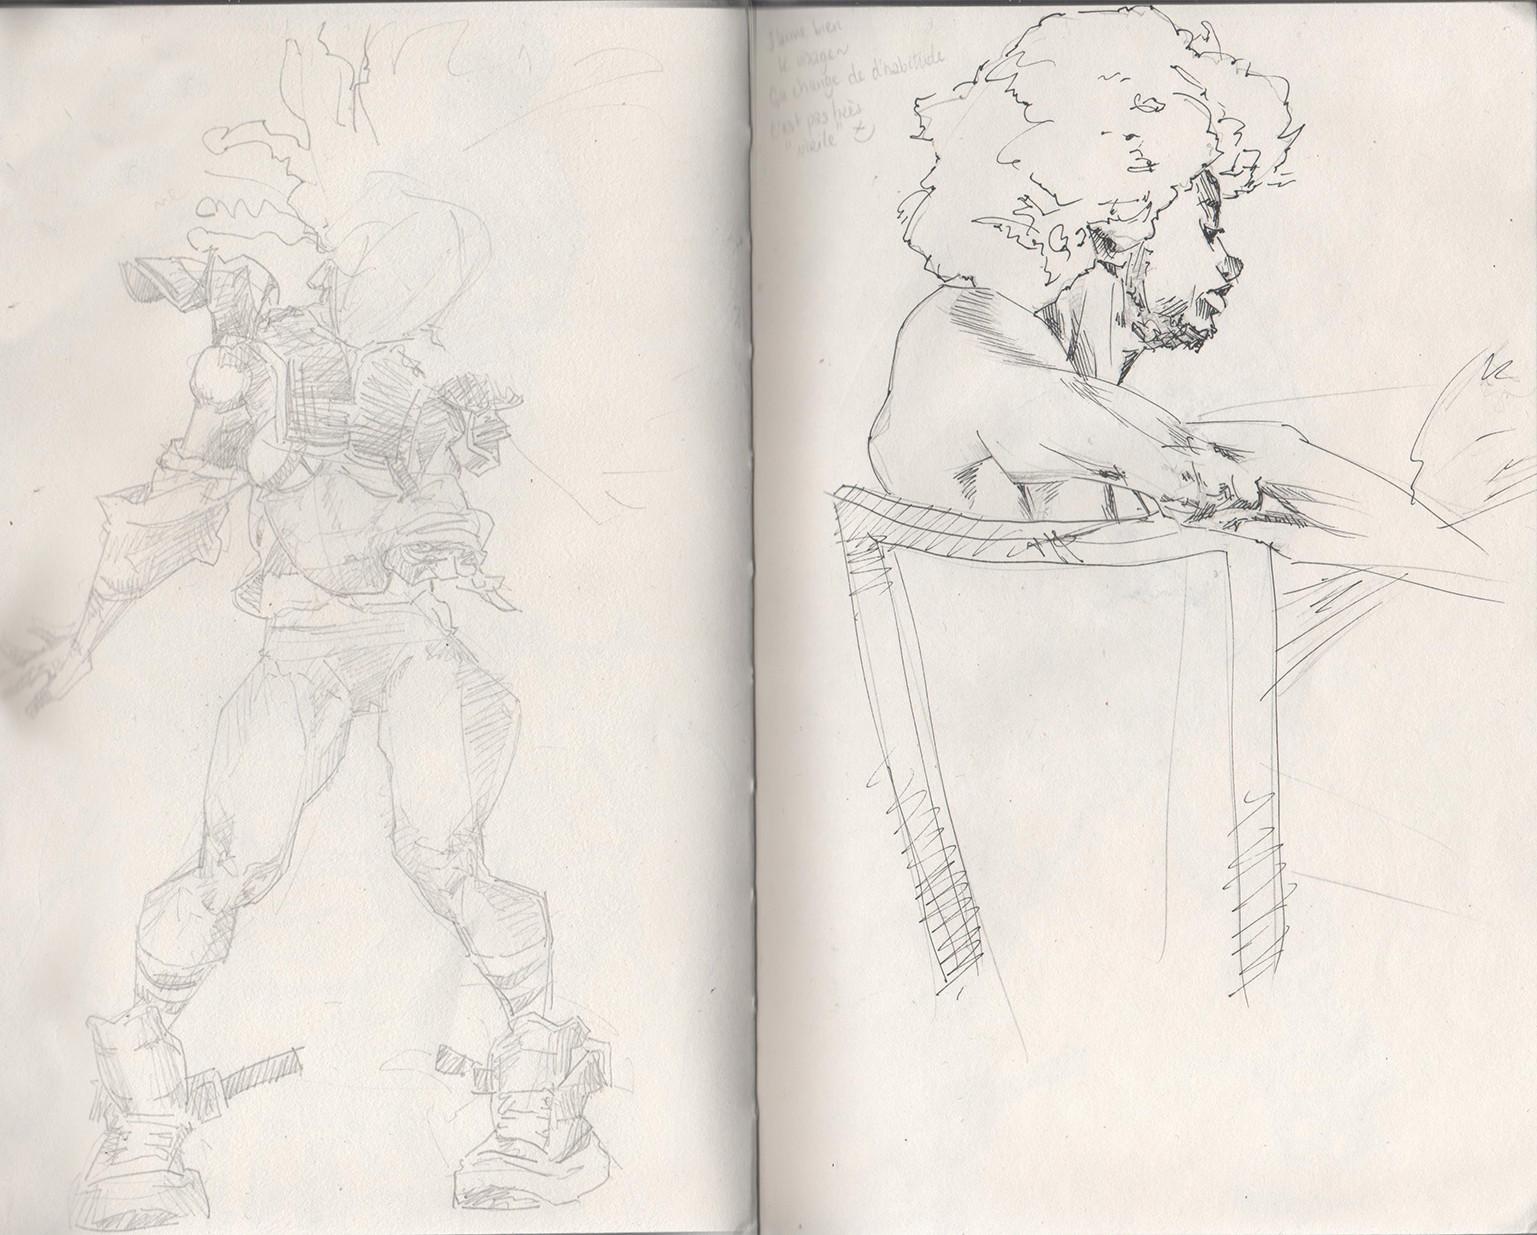 Tony gbeulie post sketch5